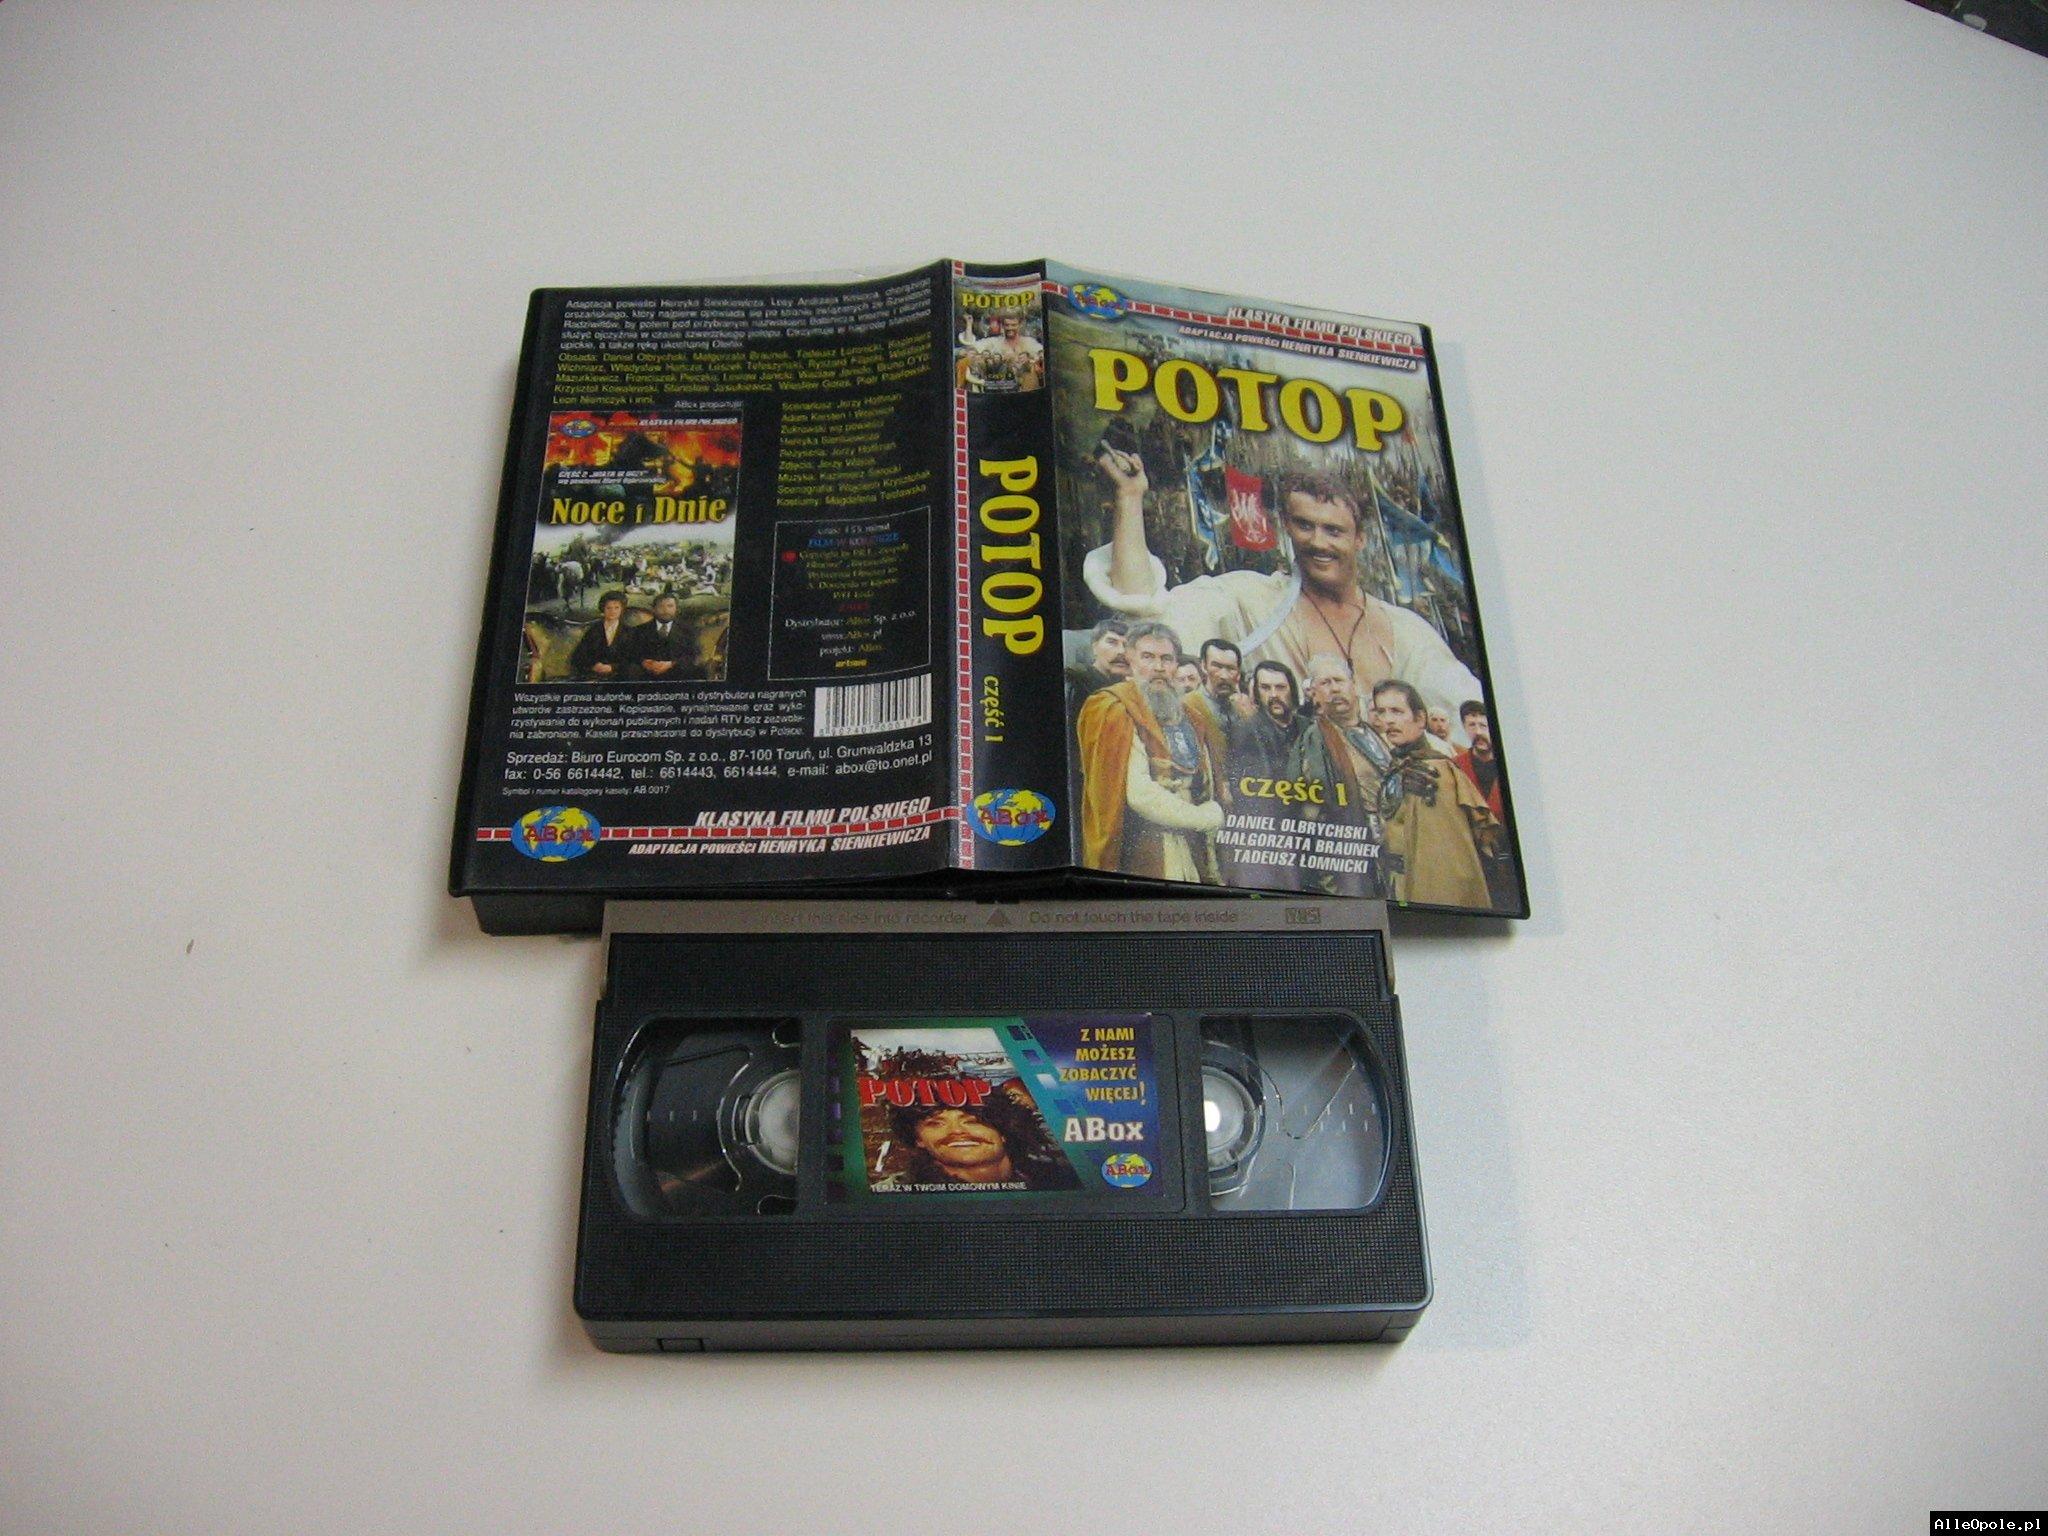 POTOP 1 - VHS Kaseta Video - Opole 1807